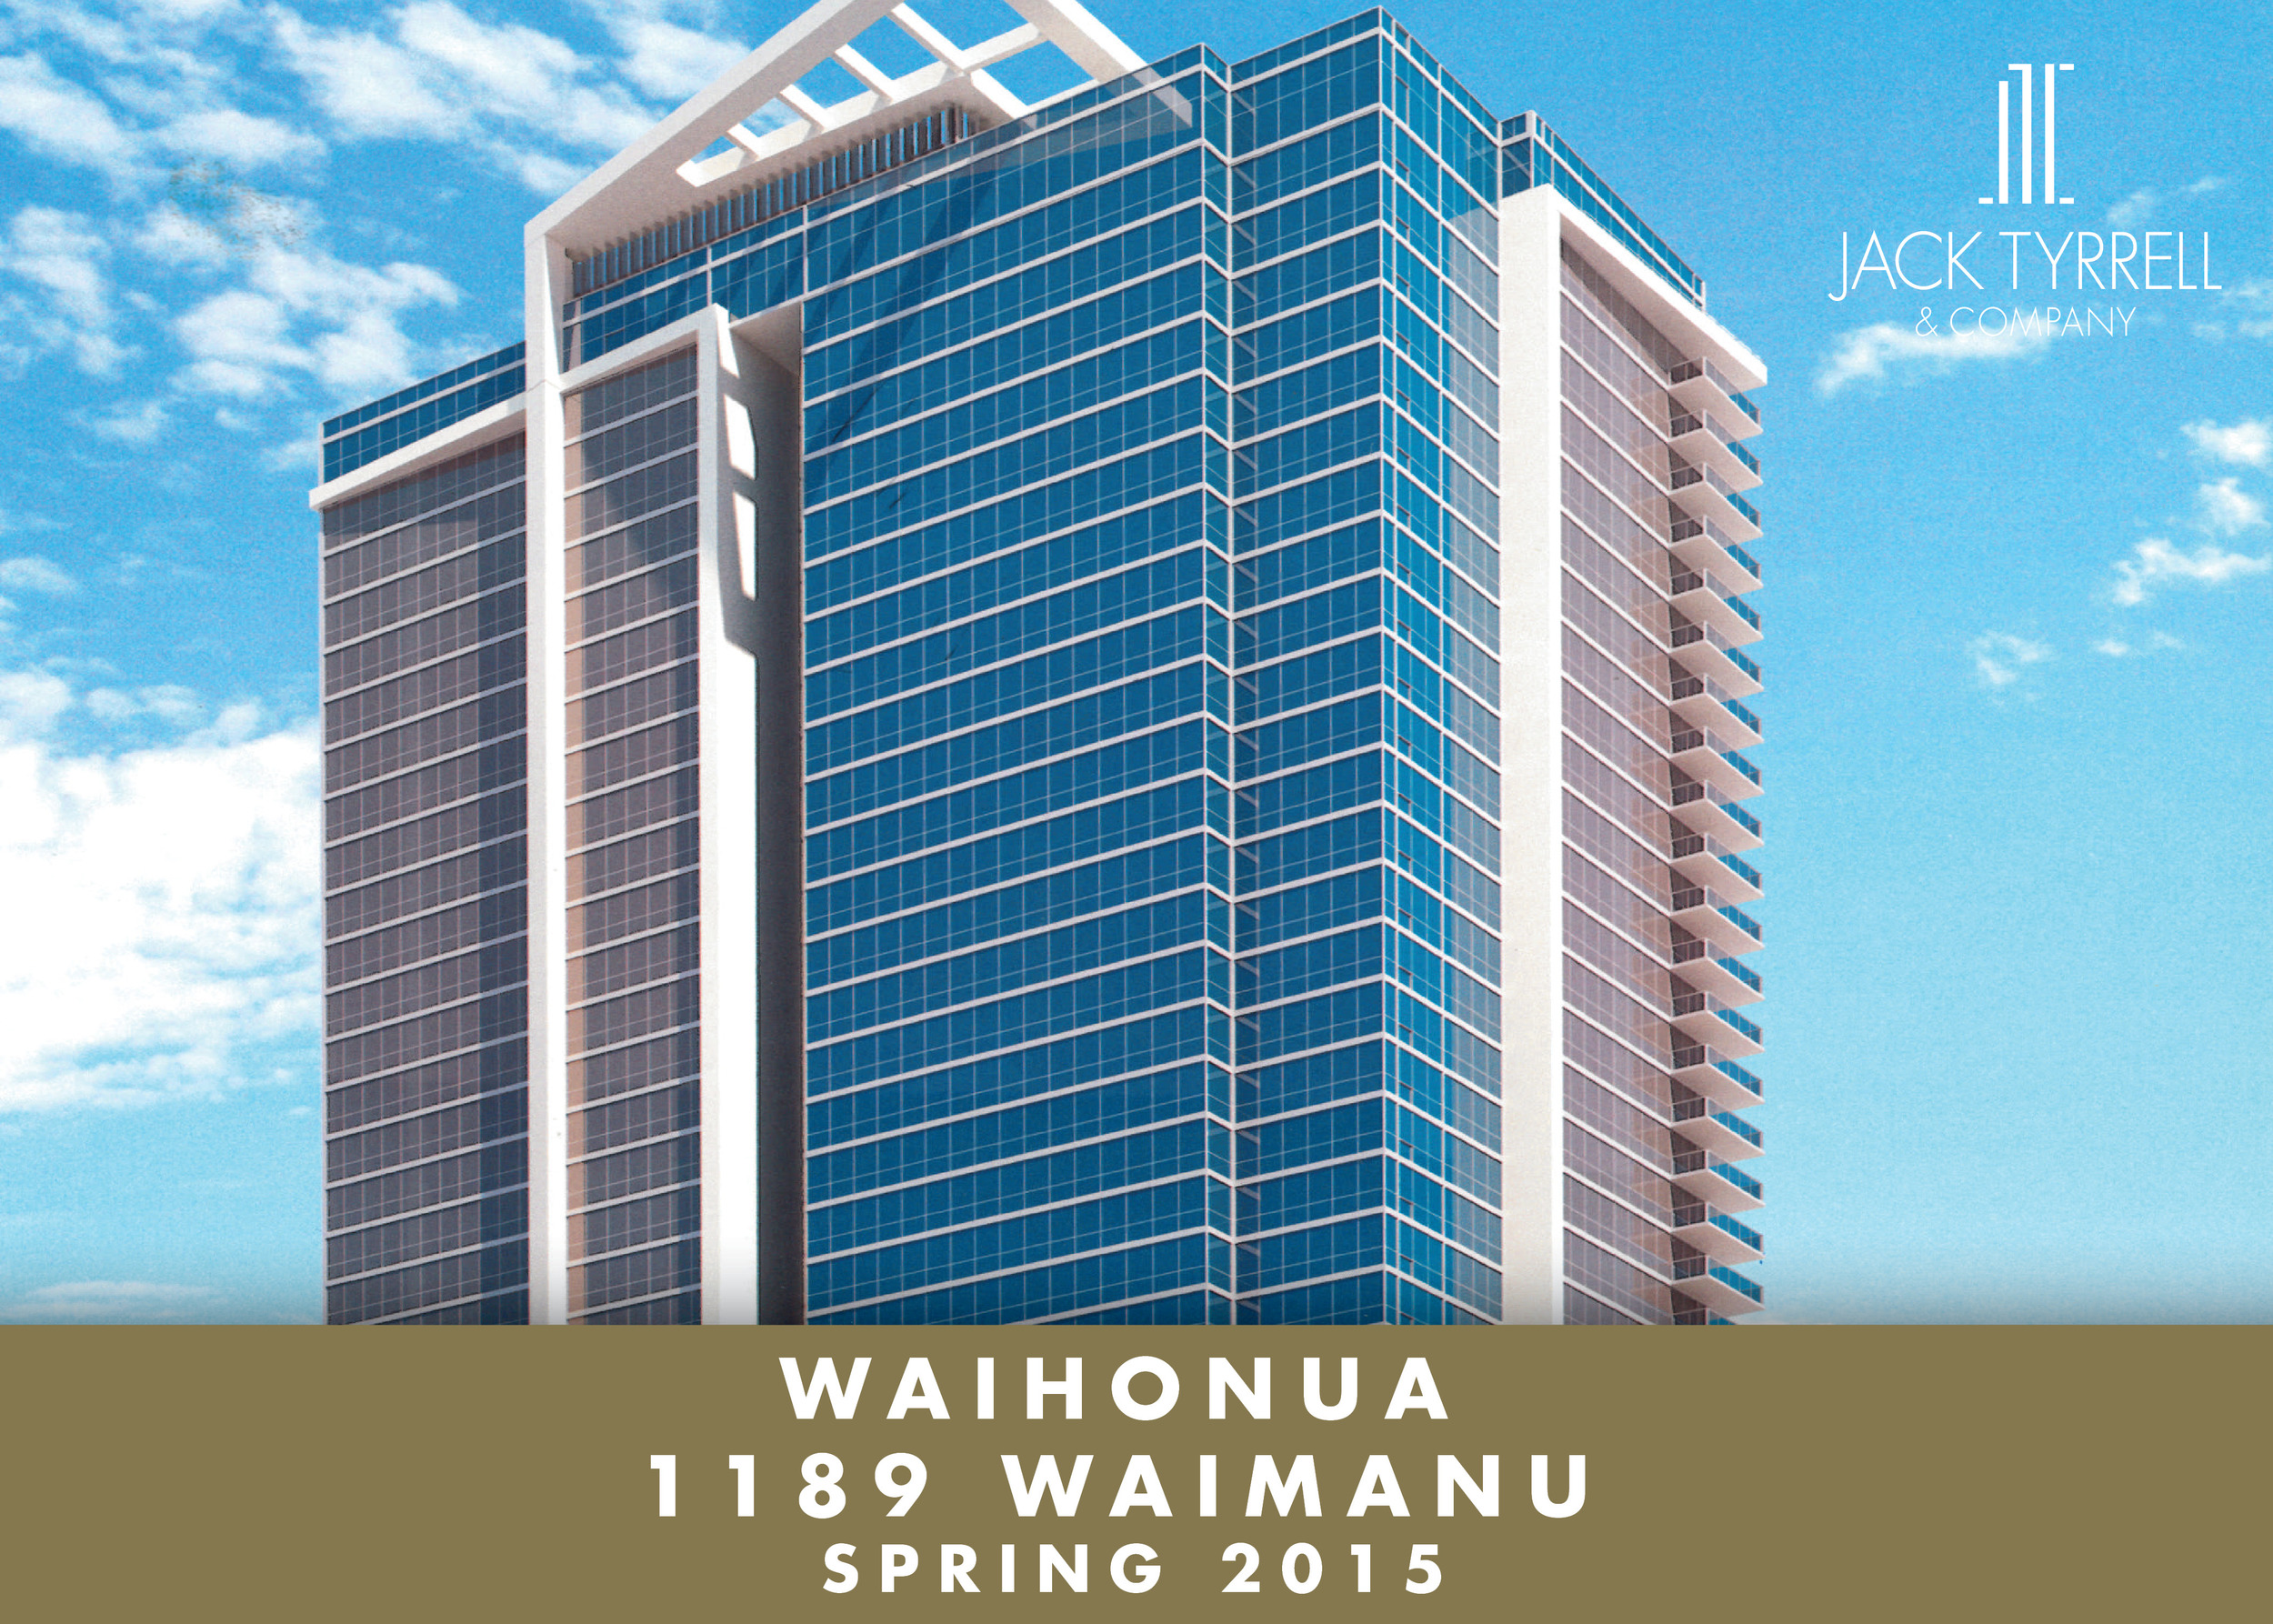 Waihonua - Completion Spring 2015